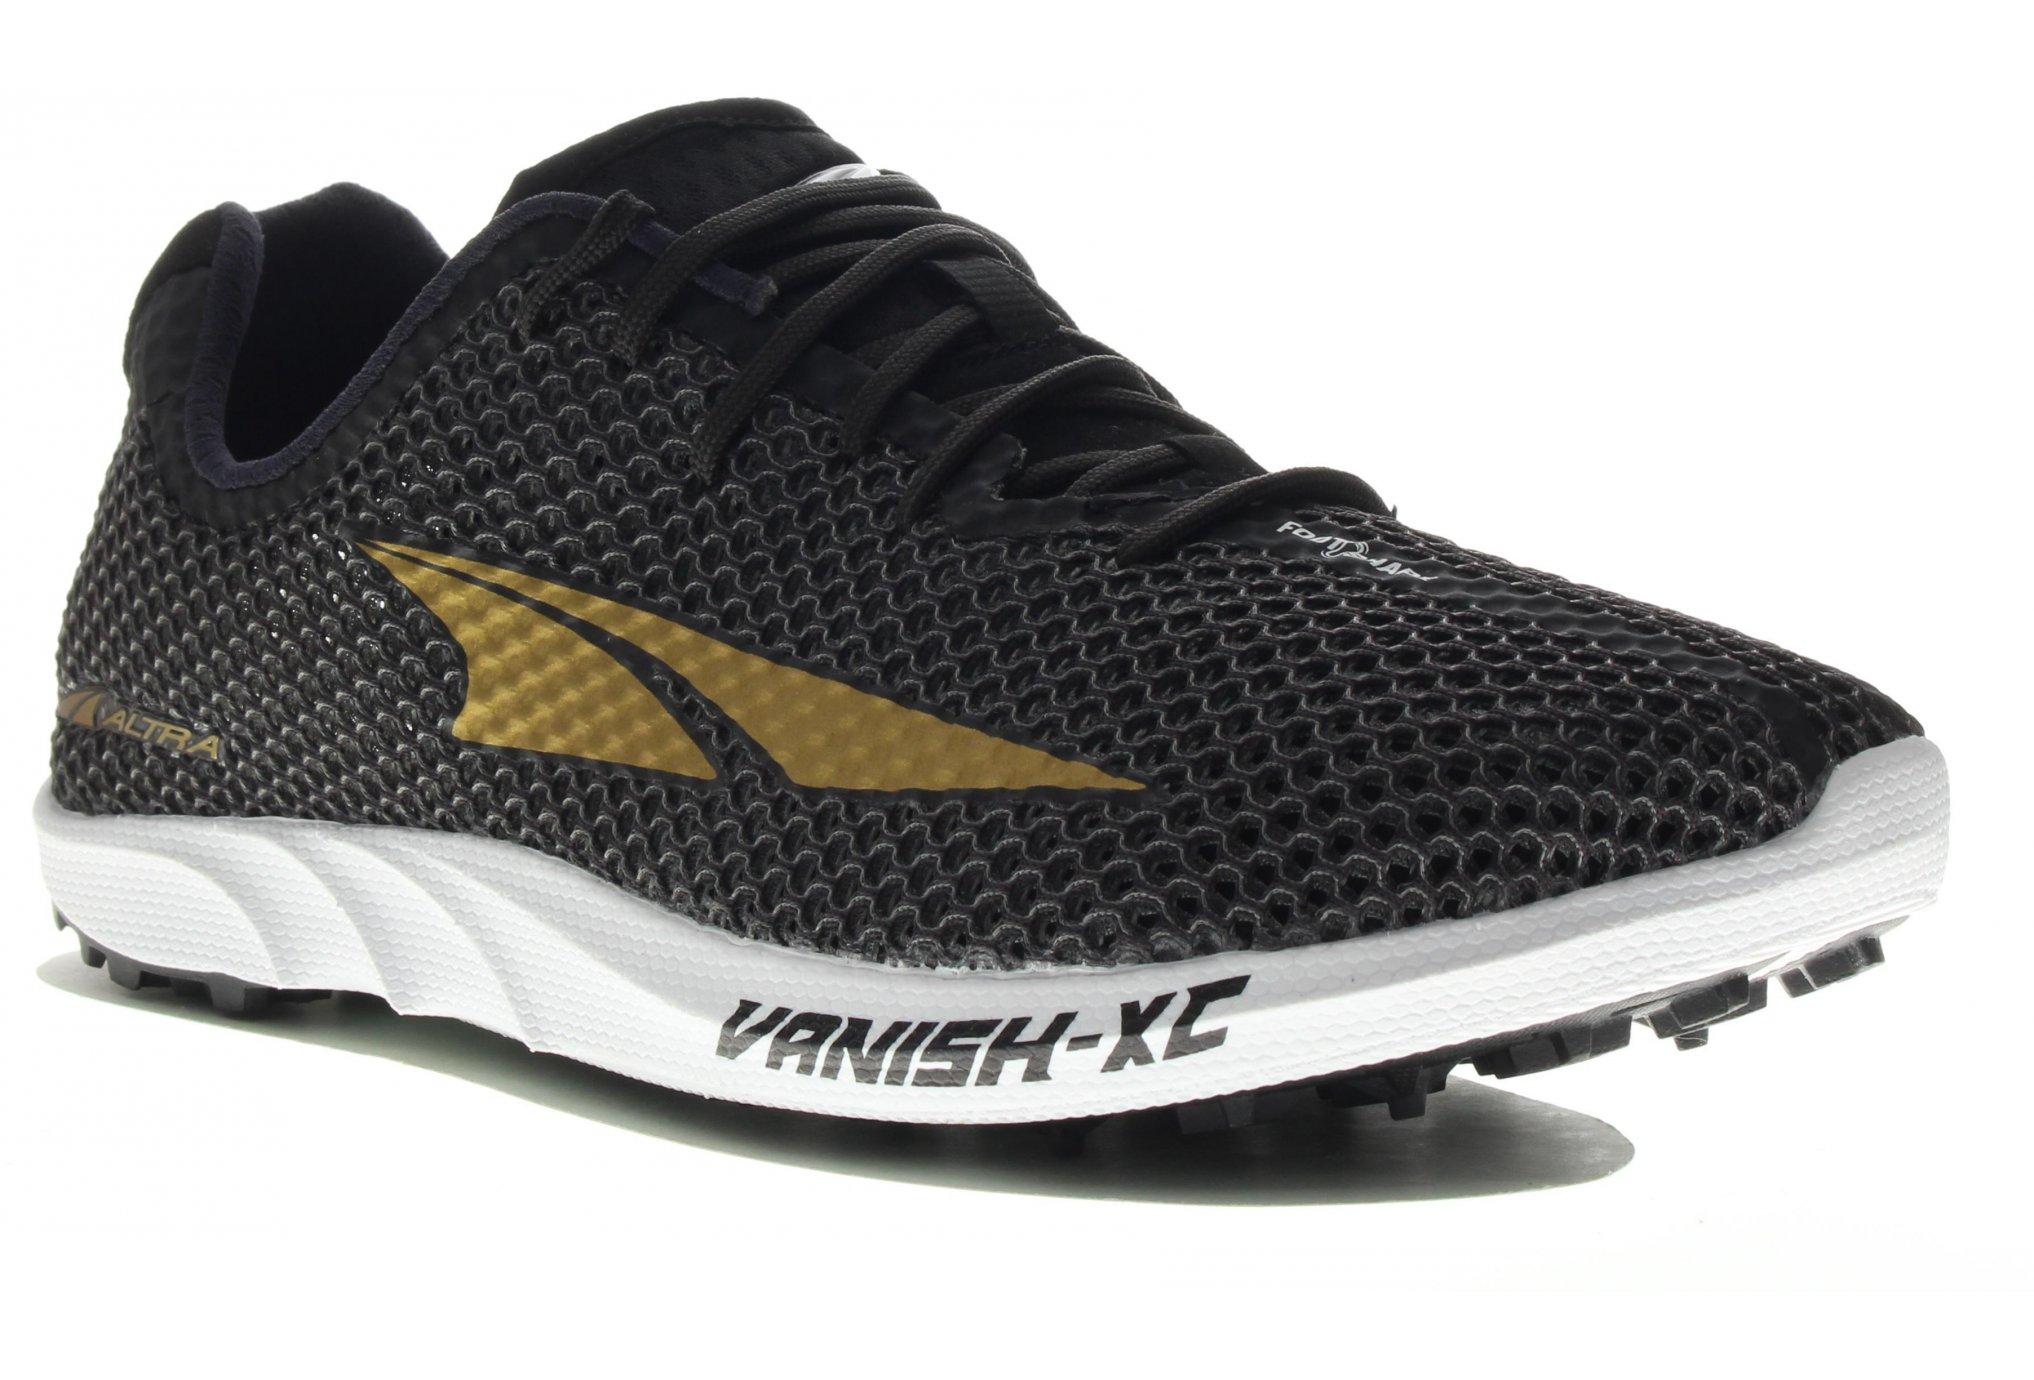 Altra Vanish XC Chaussures homme